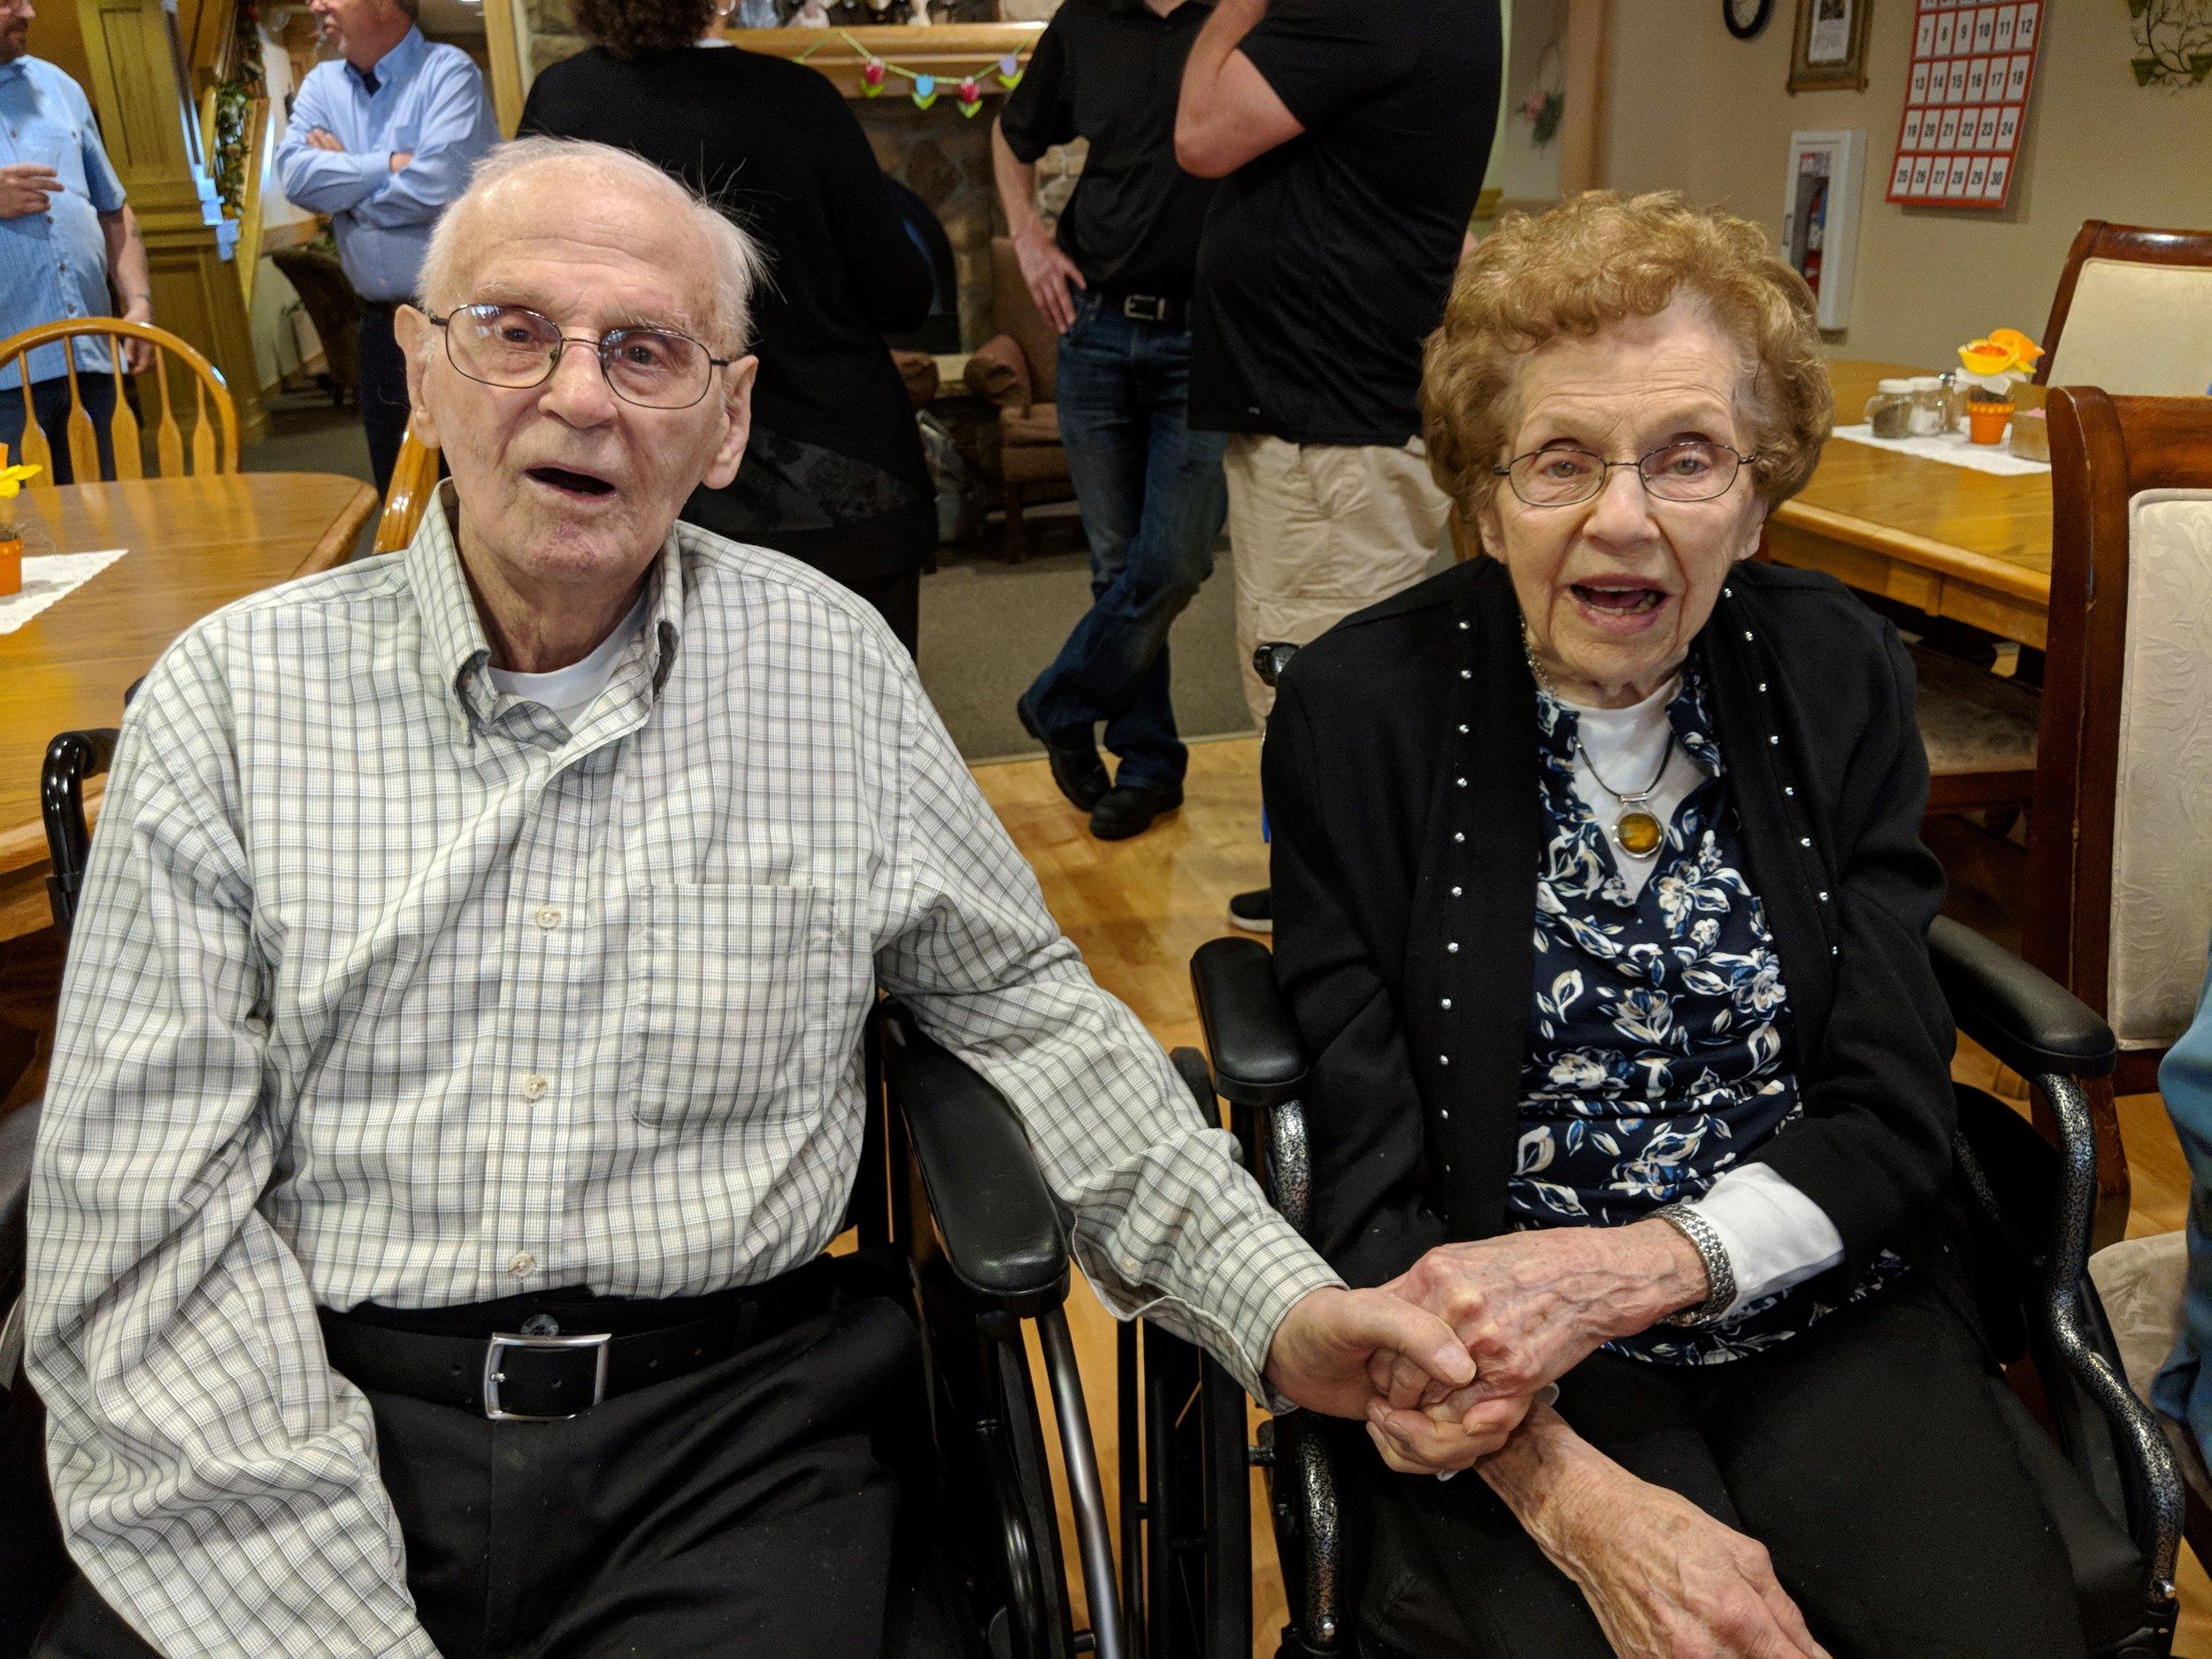 Ray & Bing's 70 wedding anniversary and Bing's 90th birthday celebration!.jpg